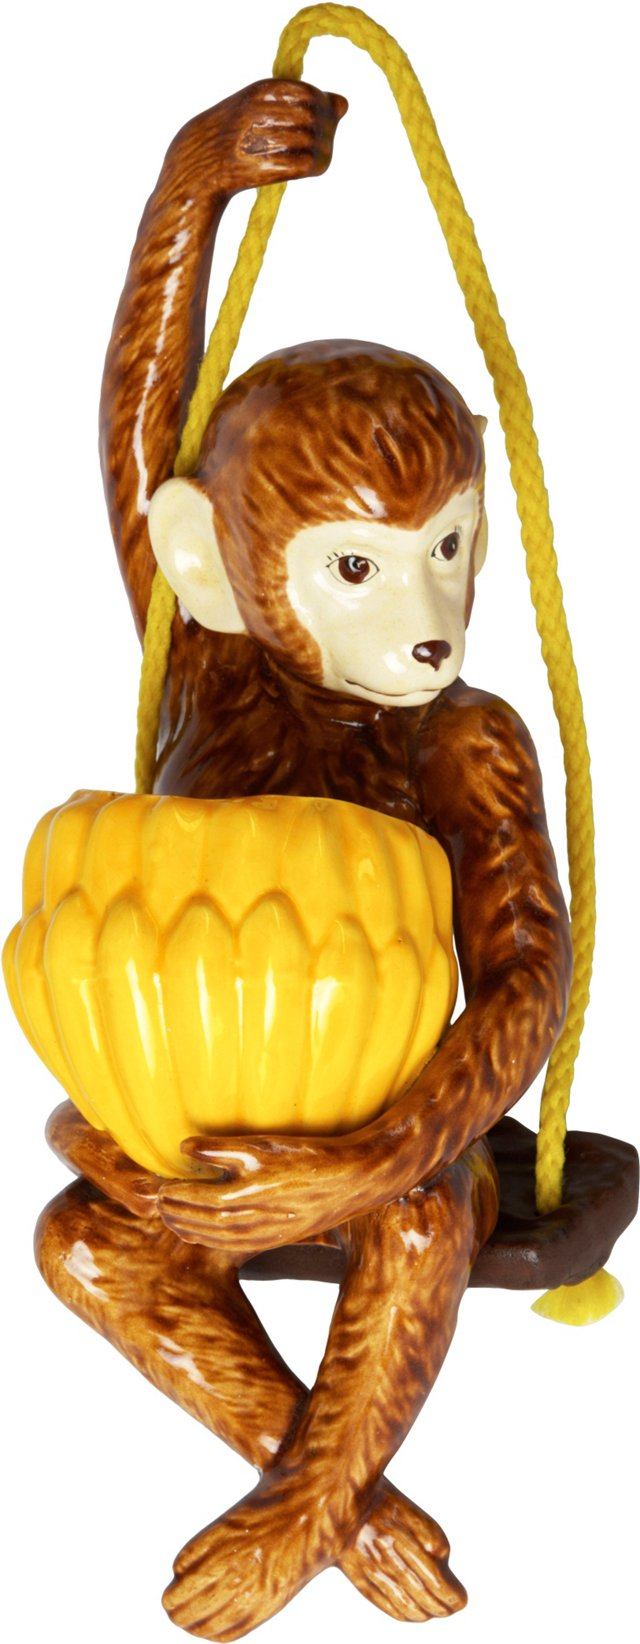 Monkey on Swing Hanging Planter